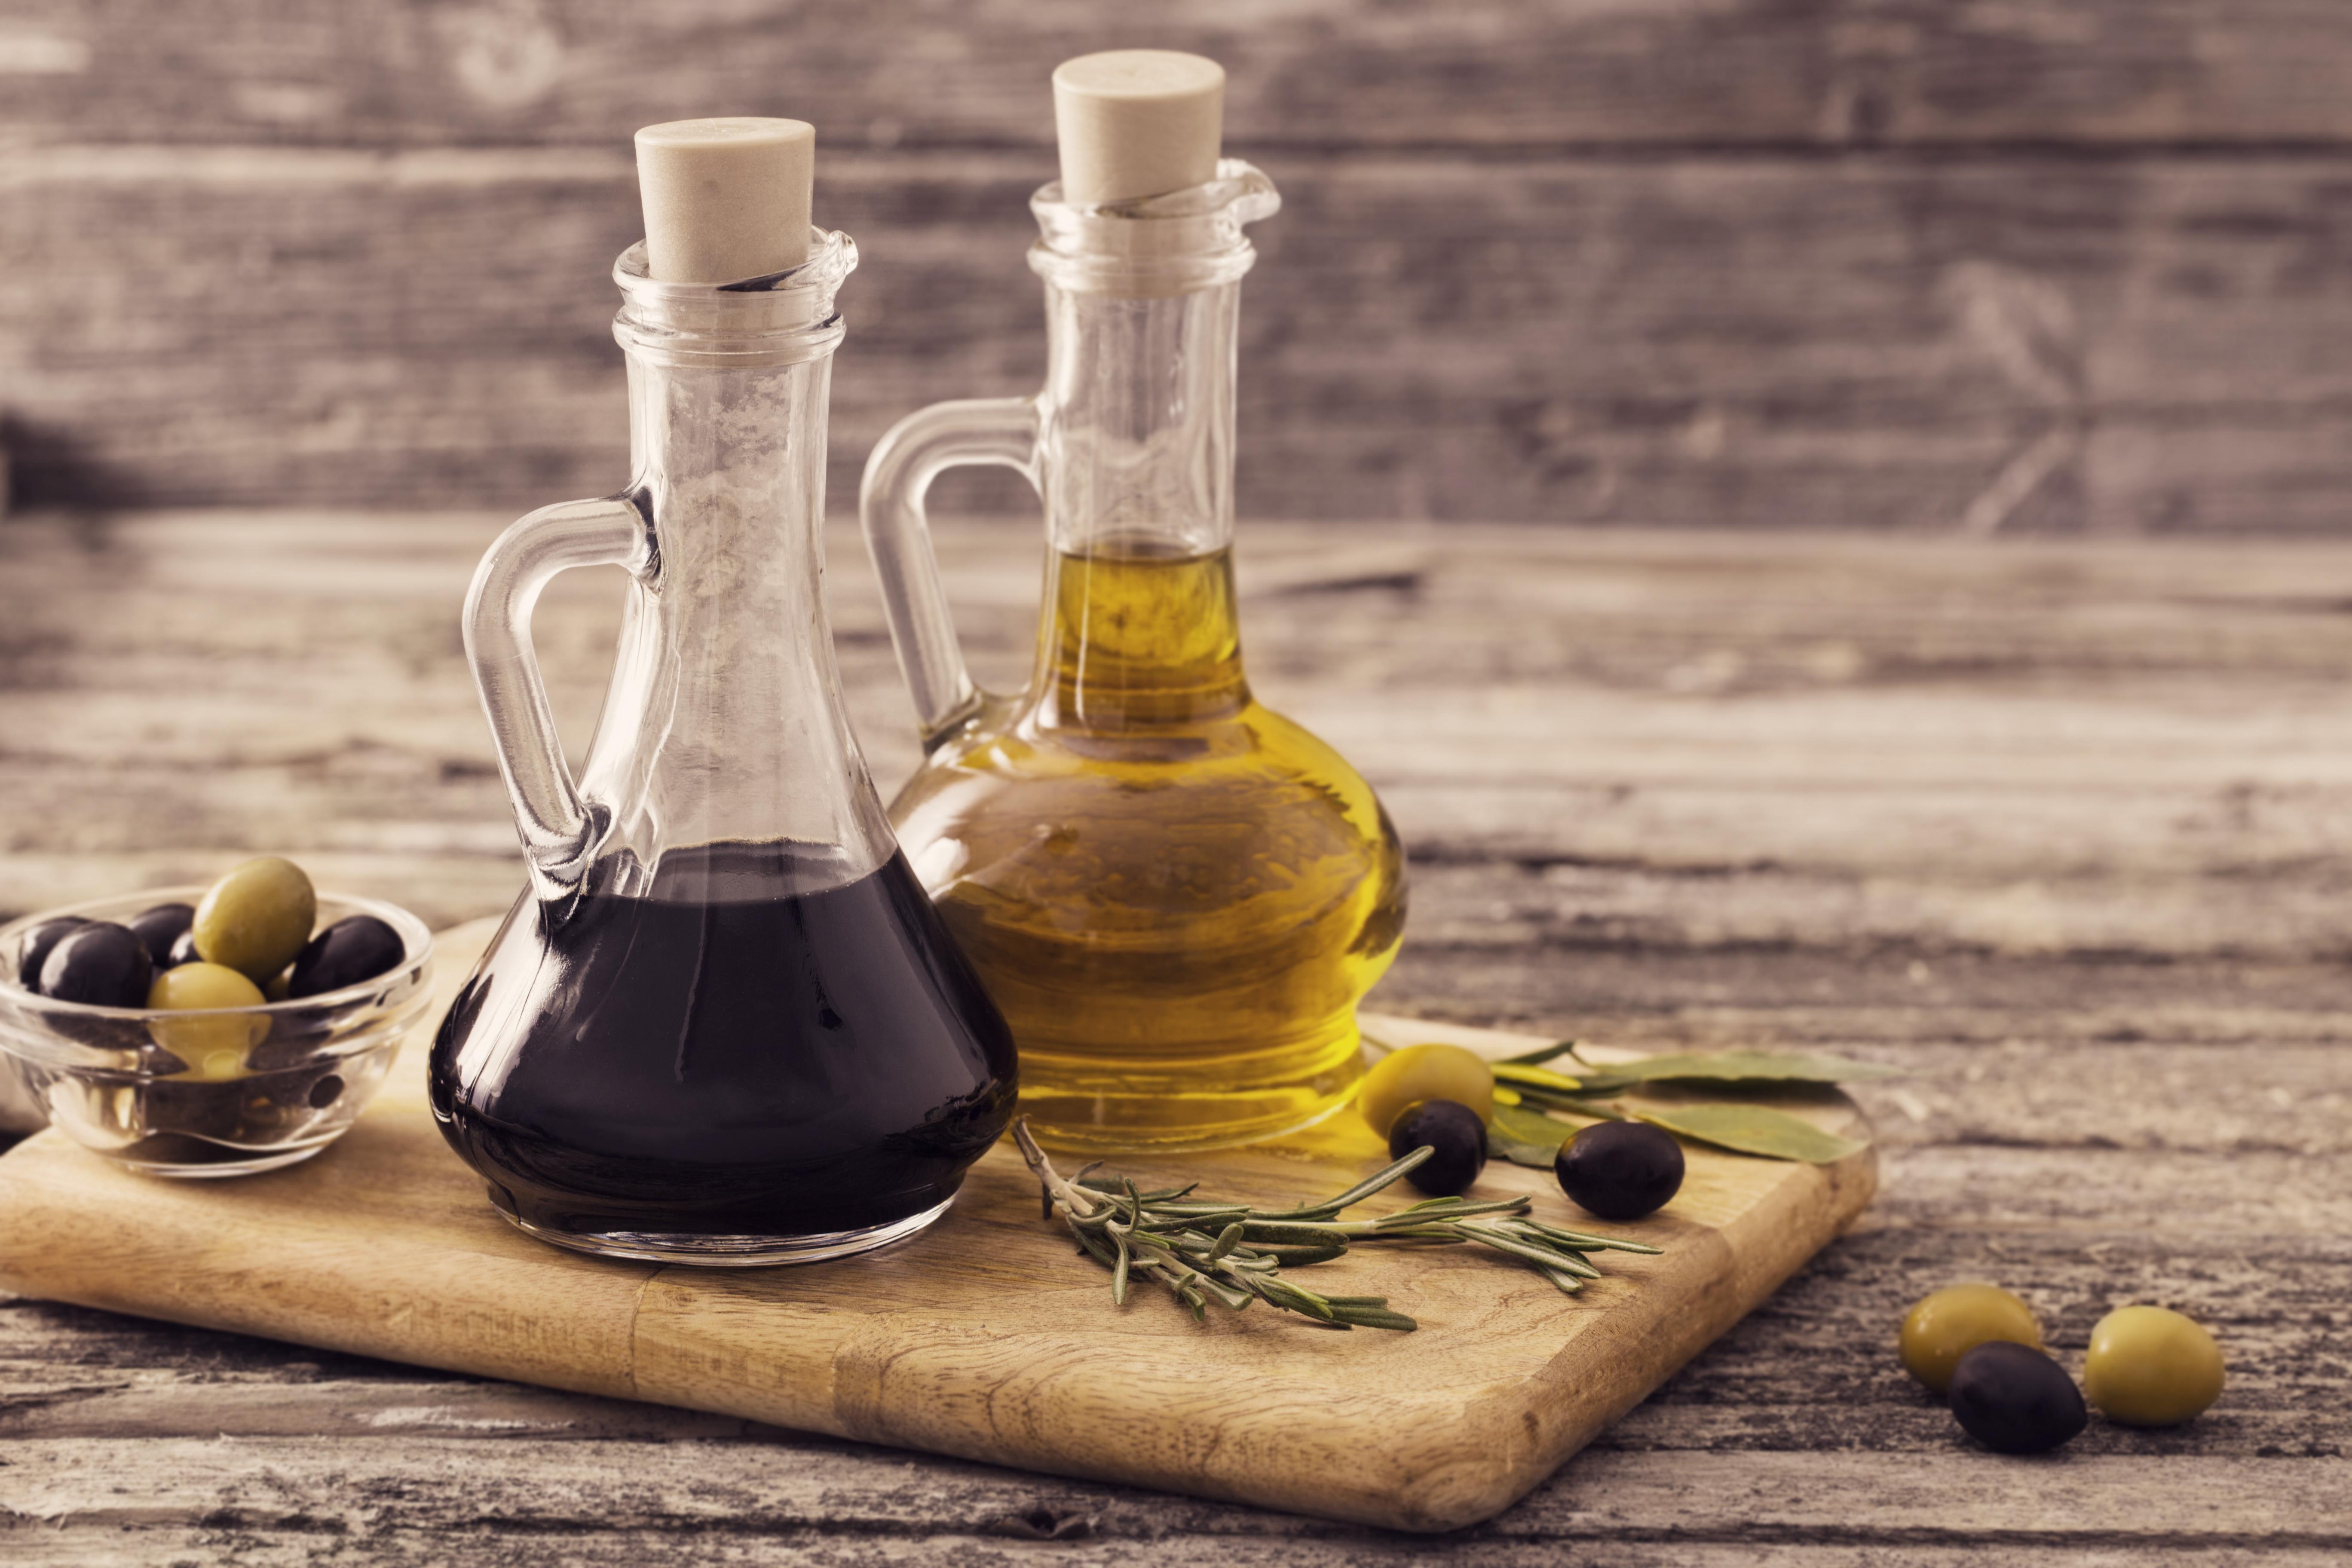 Oil and Vinegar Decanter